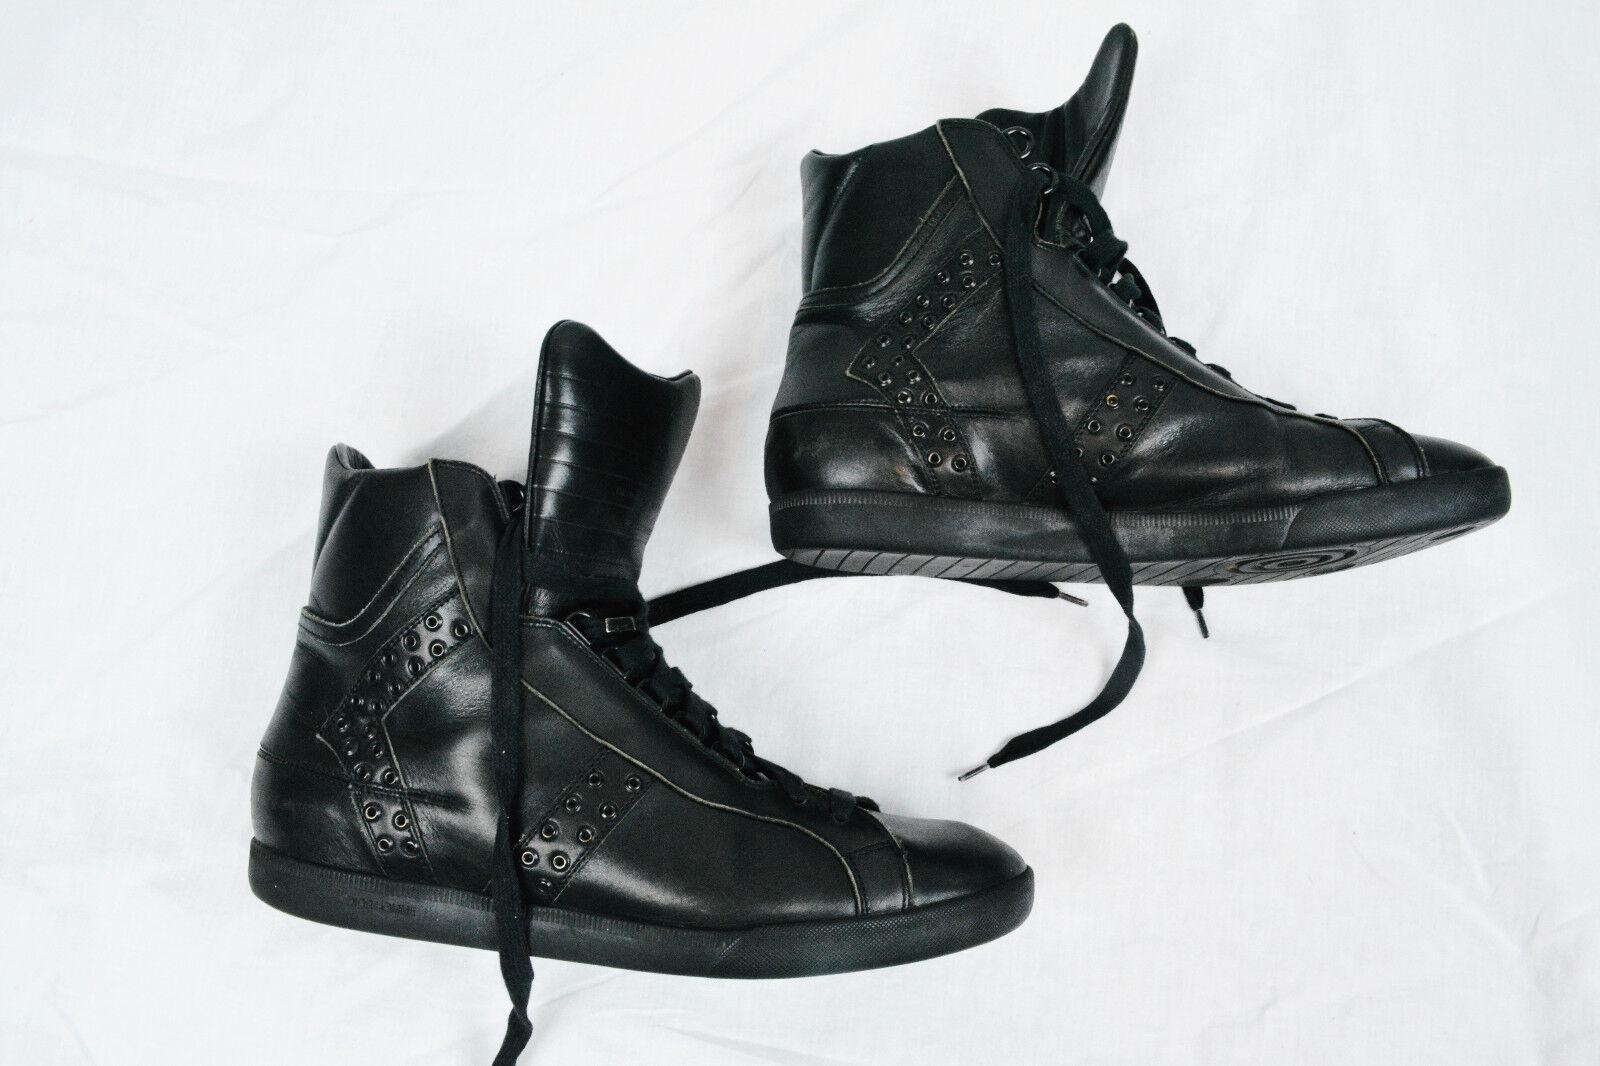 DIOR HOMME STRIP Hi-top Black Leather Stud Sneakers shoes Hedi Slimane 43.5 10